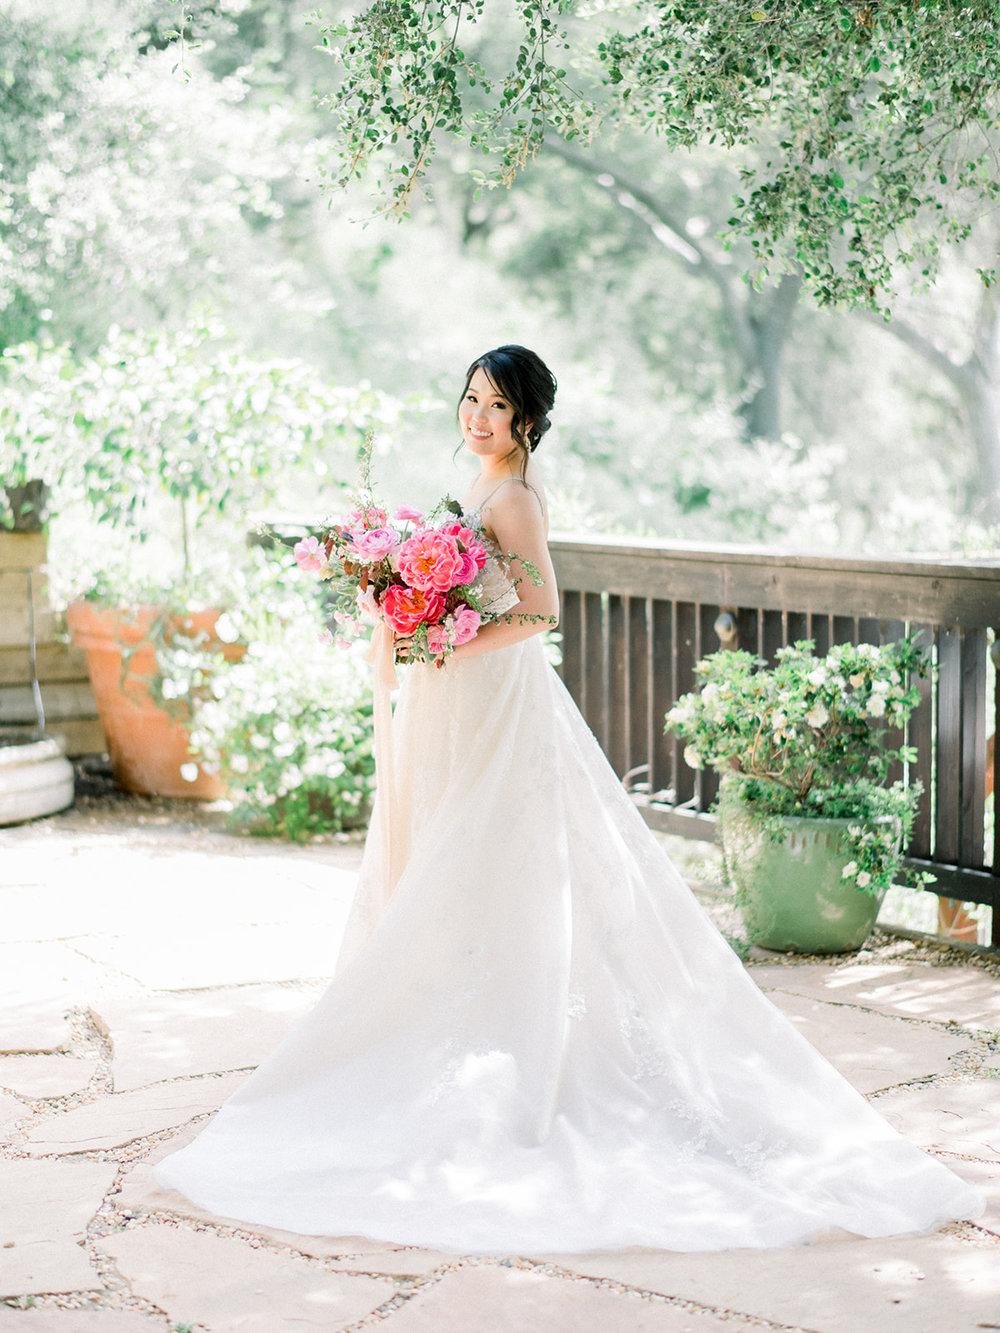 jueunandjon-etherandsmith-wedding-390.jpg